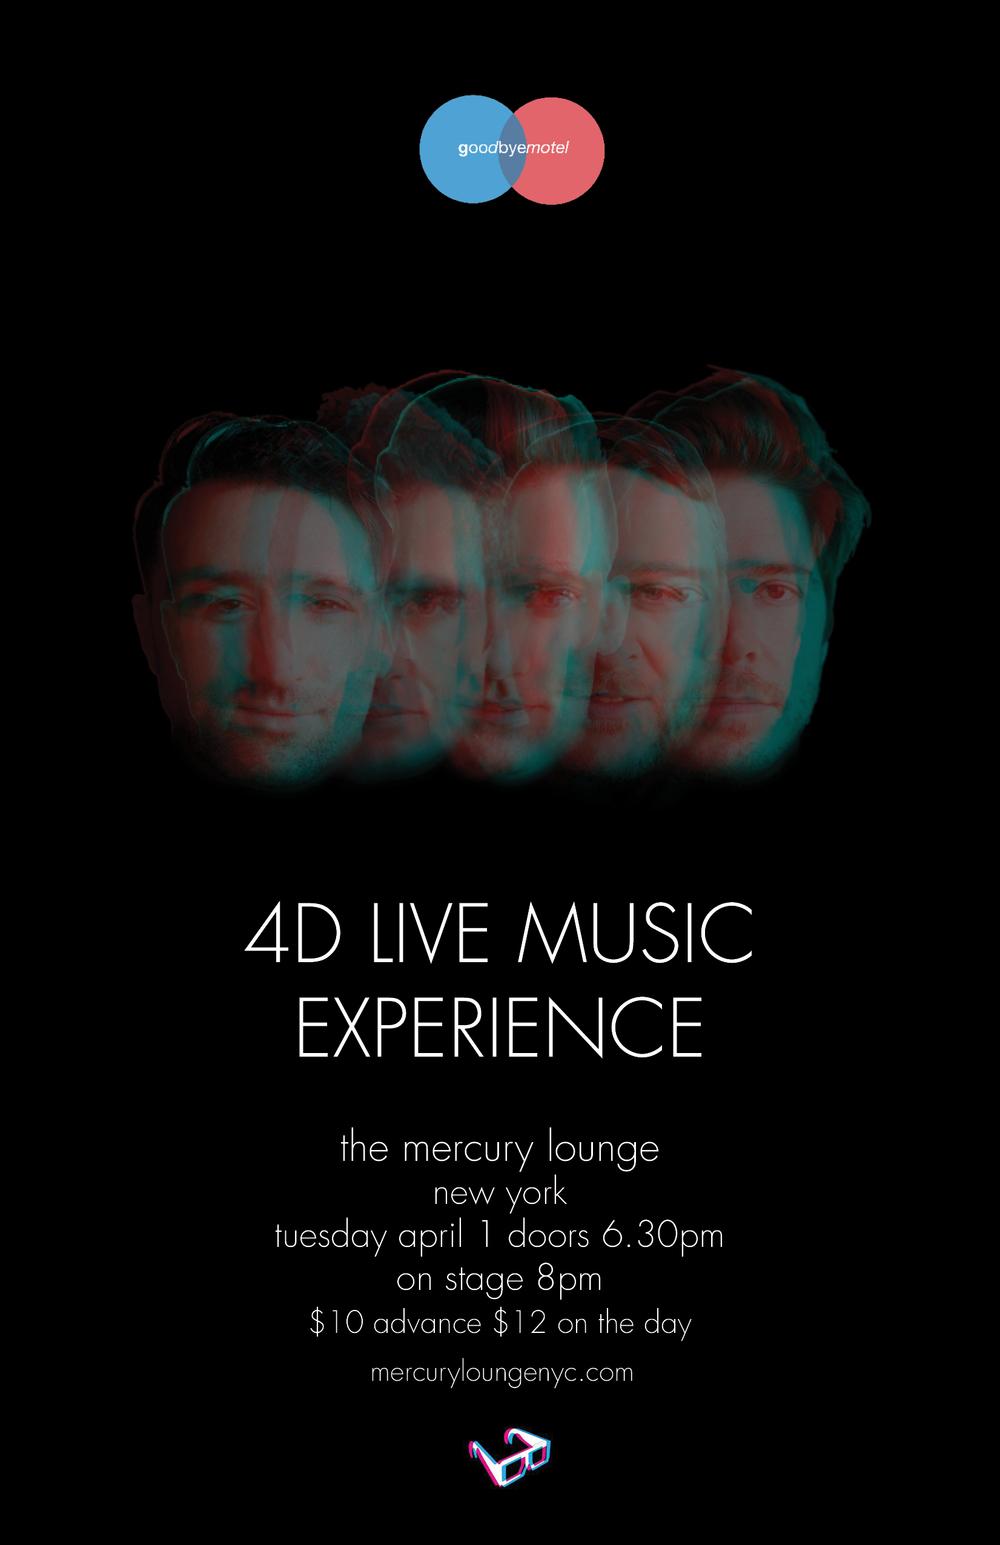 4D LME Flyer Merc Lounge gig poster.jpeg